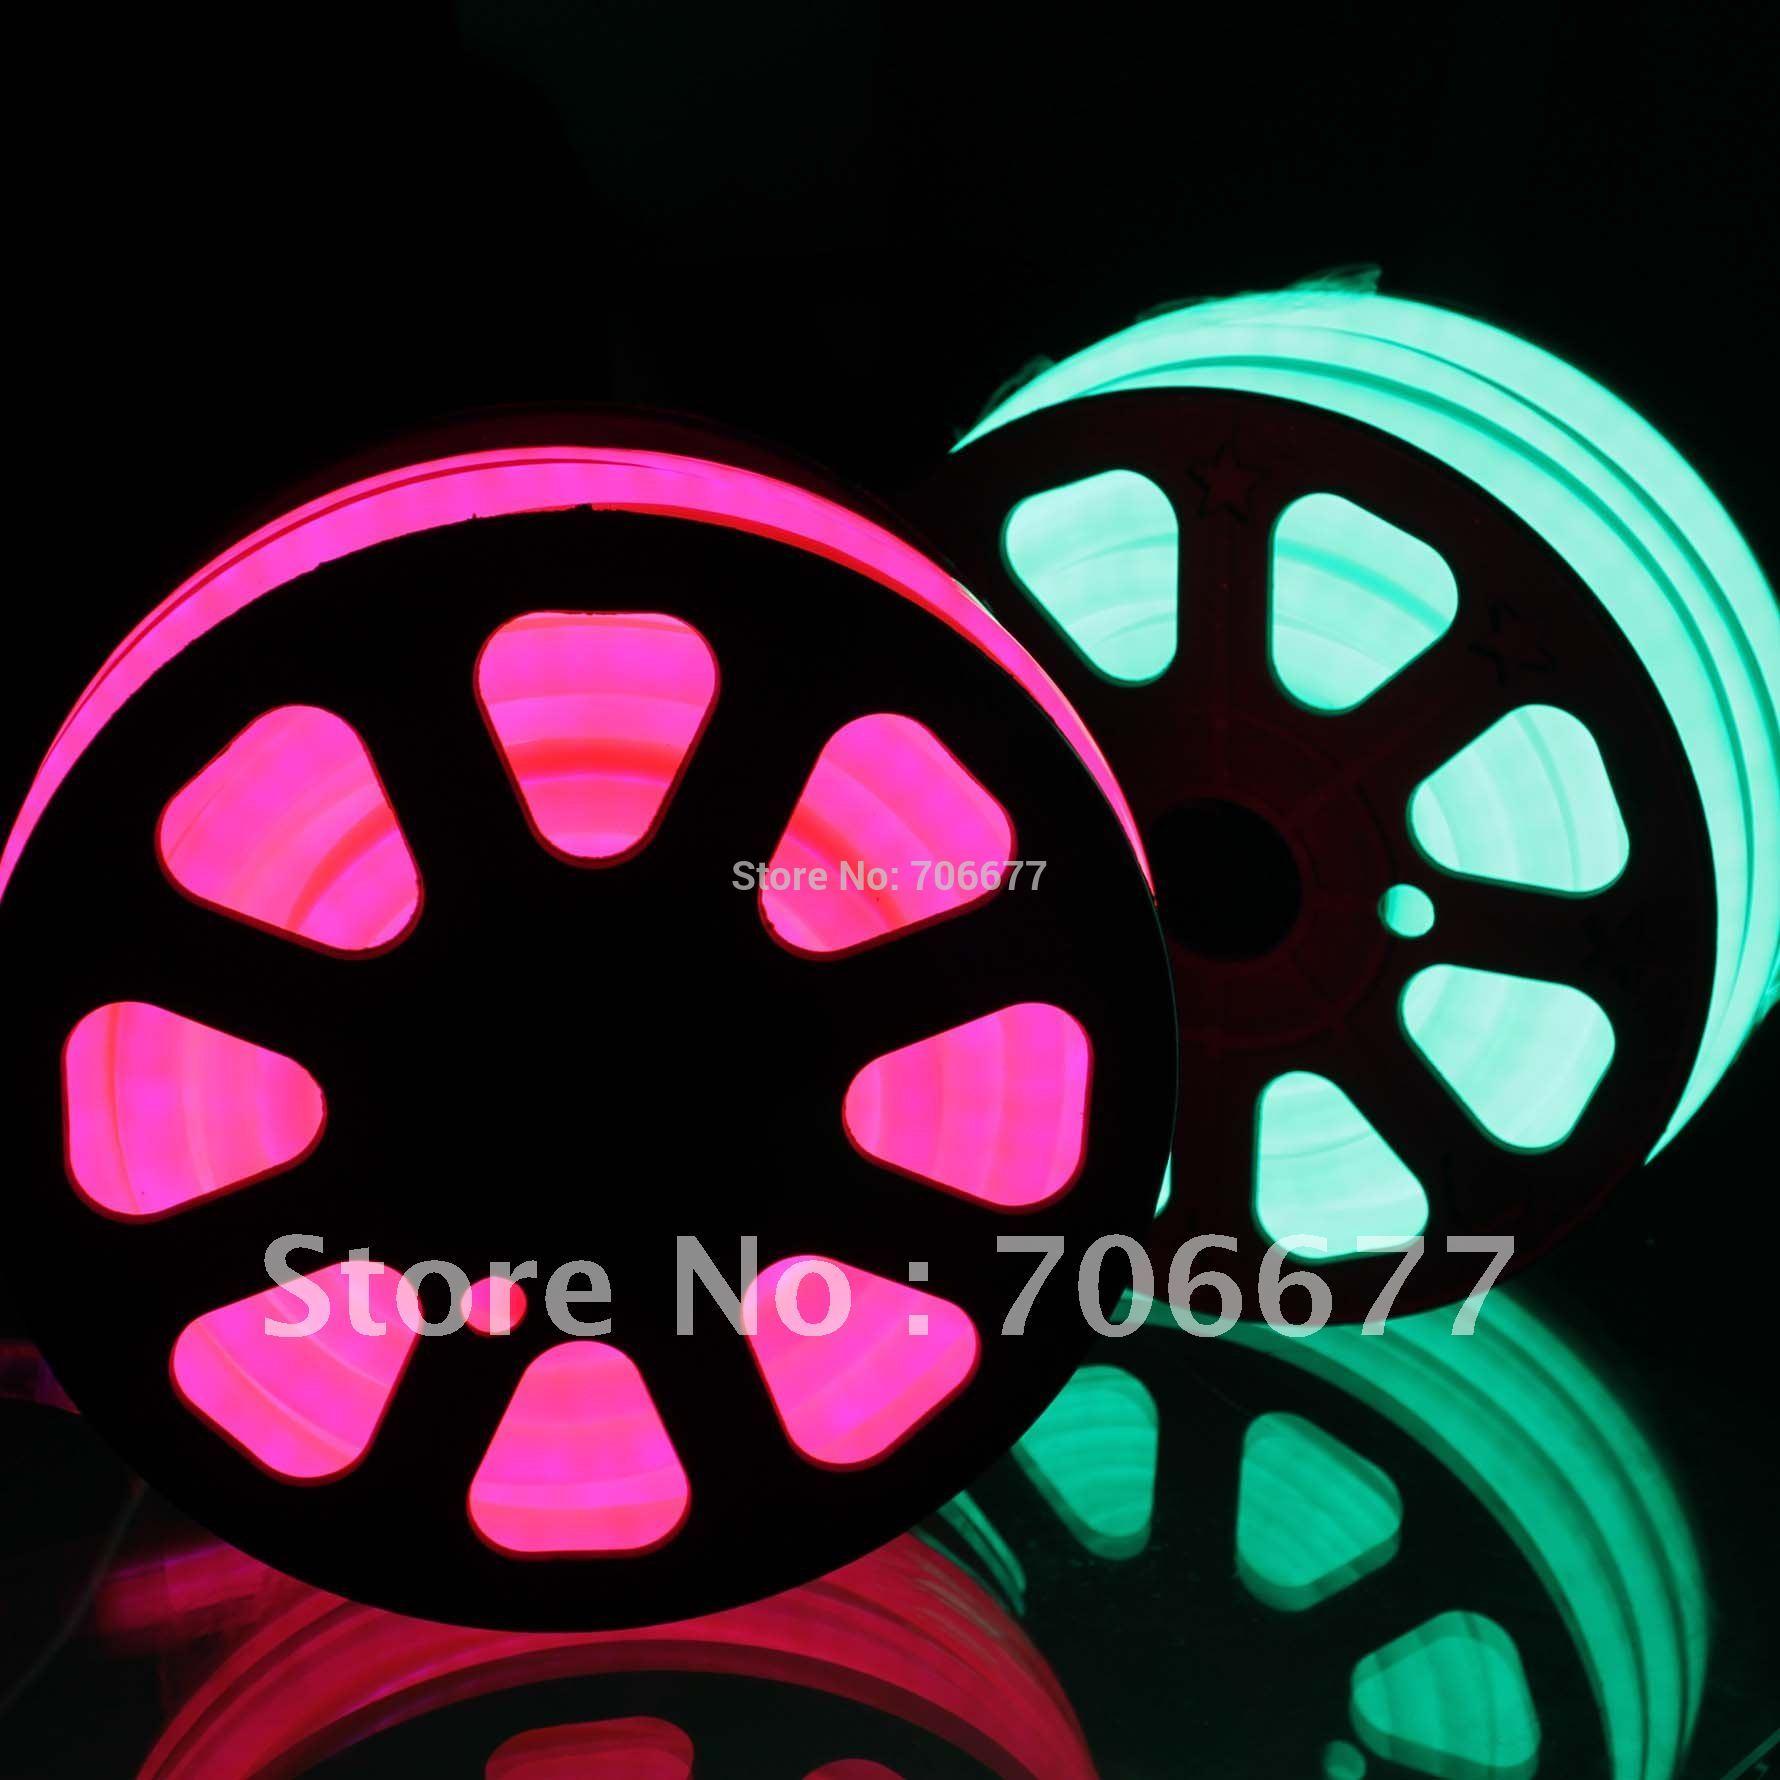 Round shape pink light neon flex, 24VDC input, 100leds/m, using for outdoor decoration, making LOGO sign, Free shipping(China (Mainland))